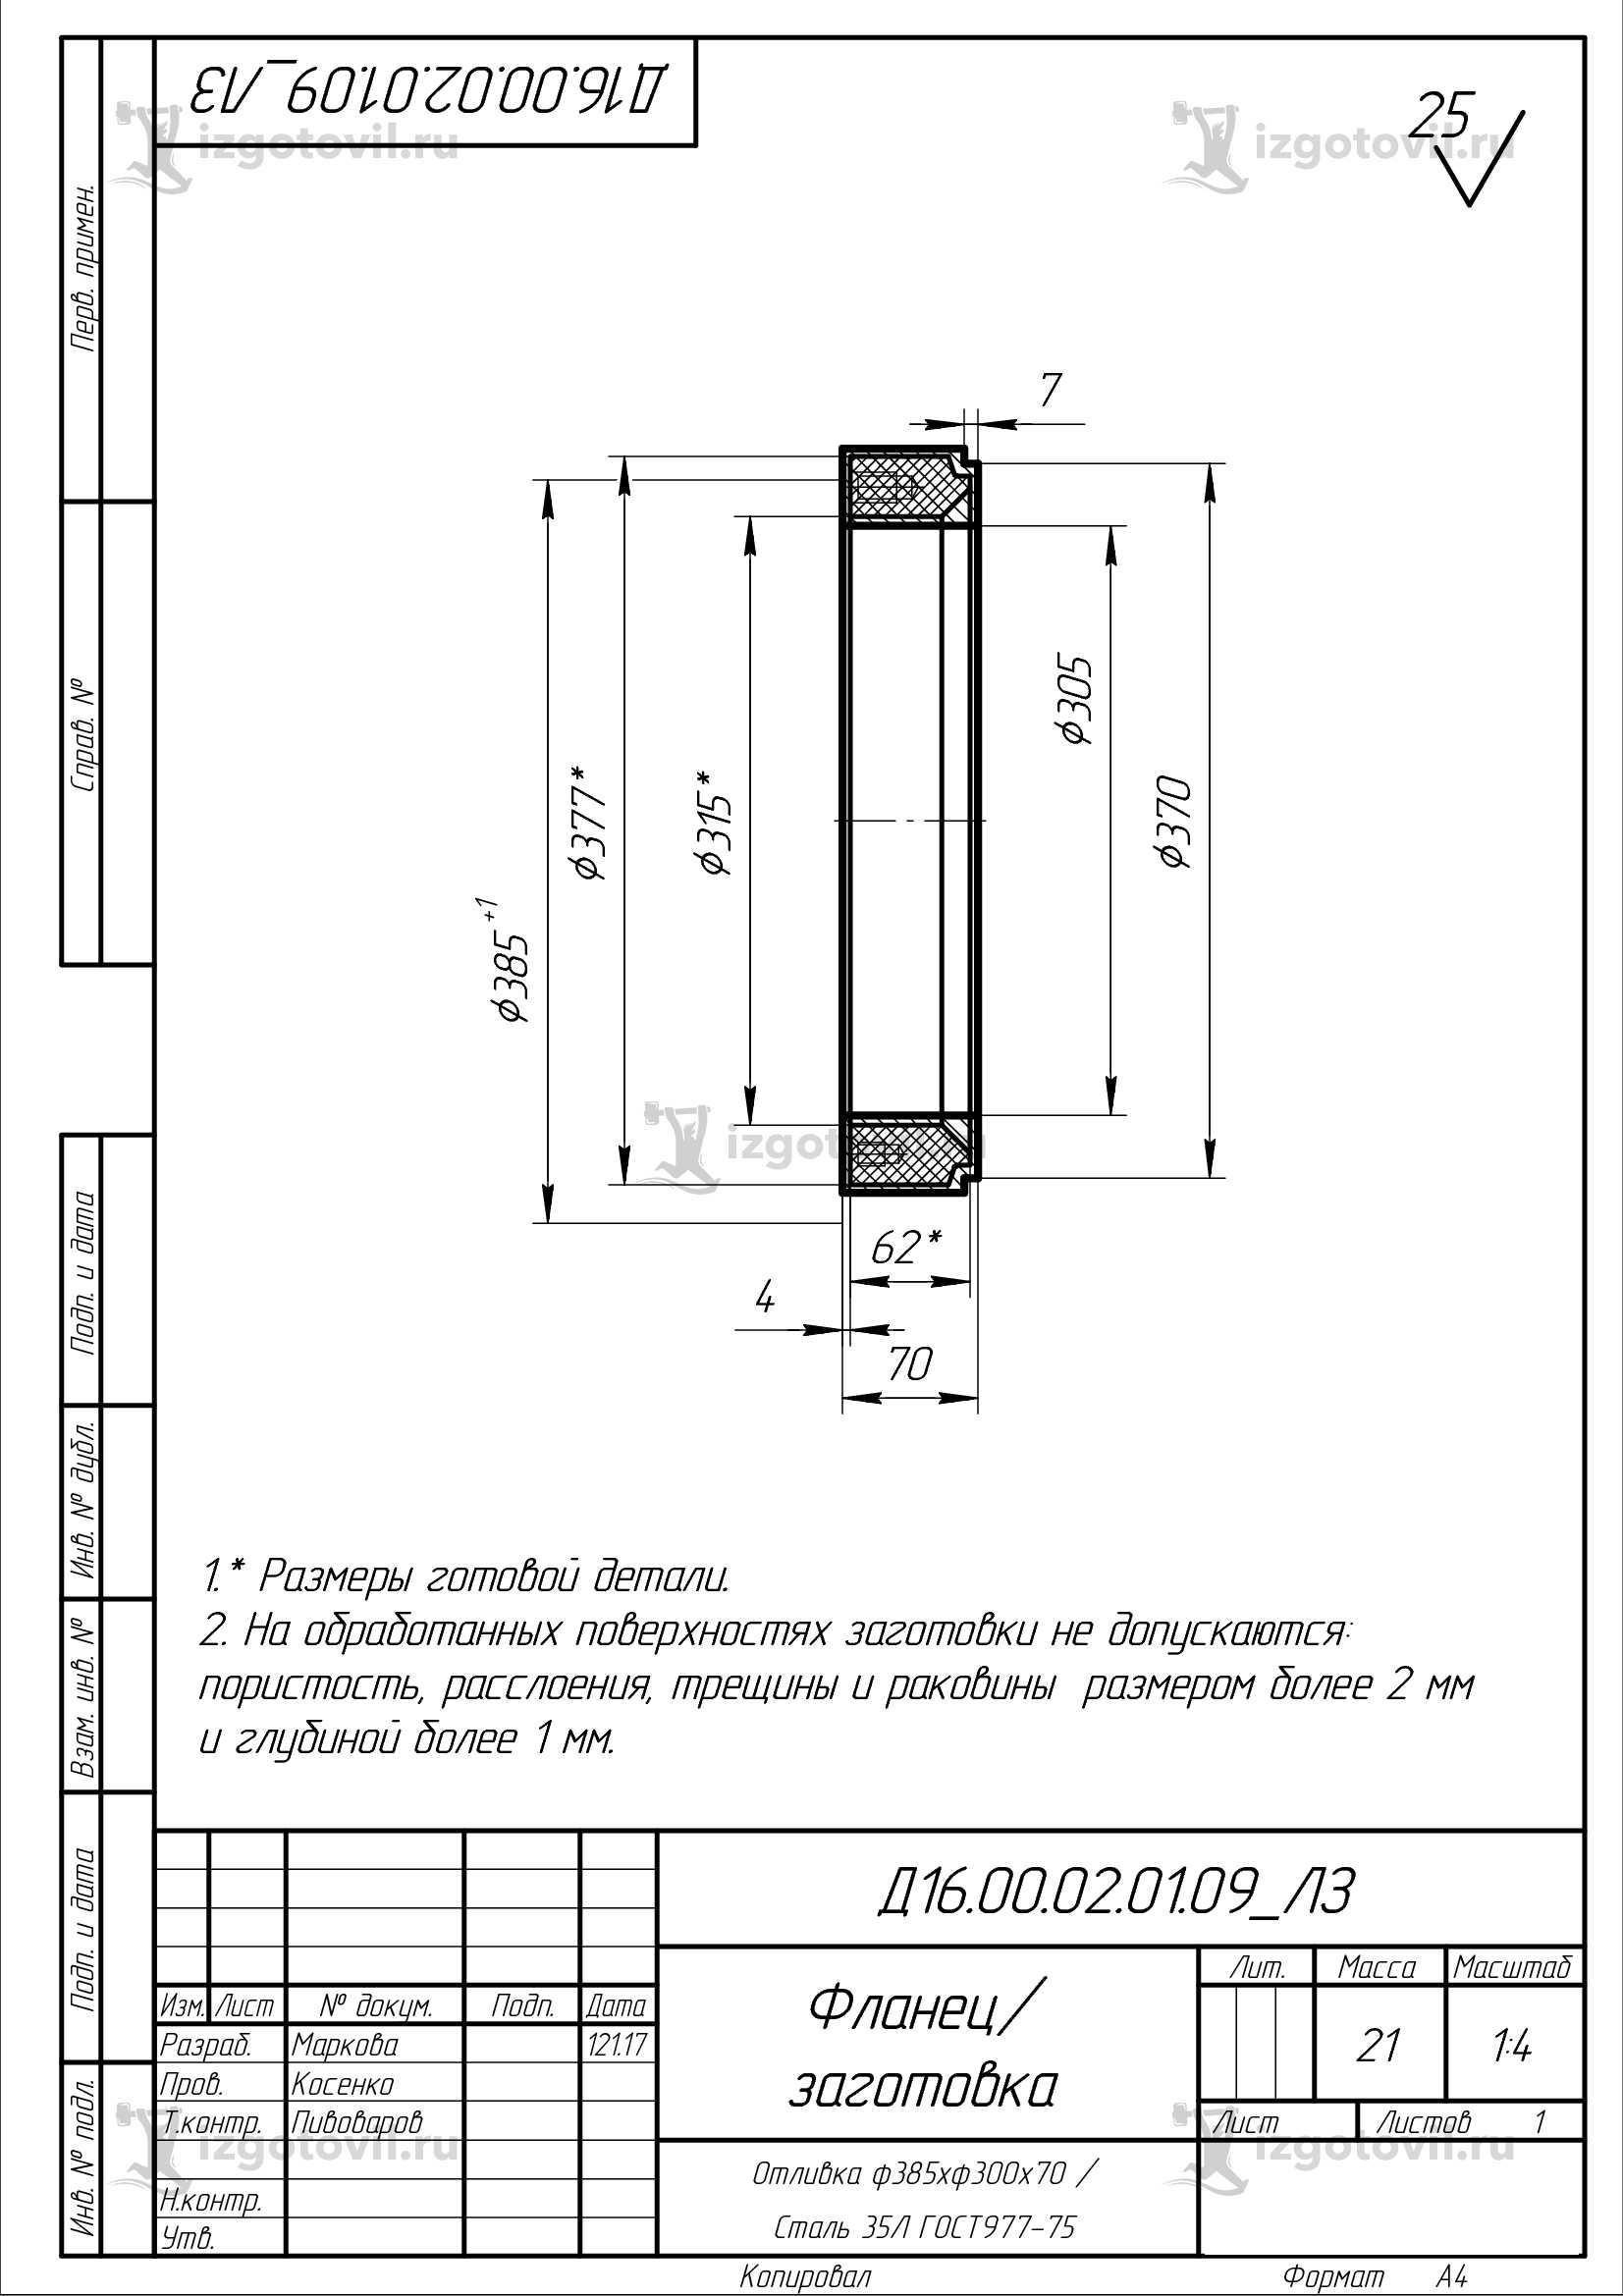 Литейное производство (заготовки)